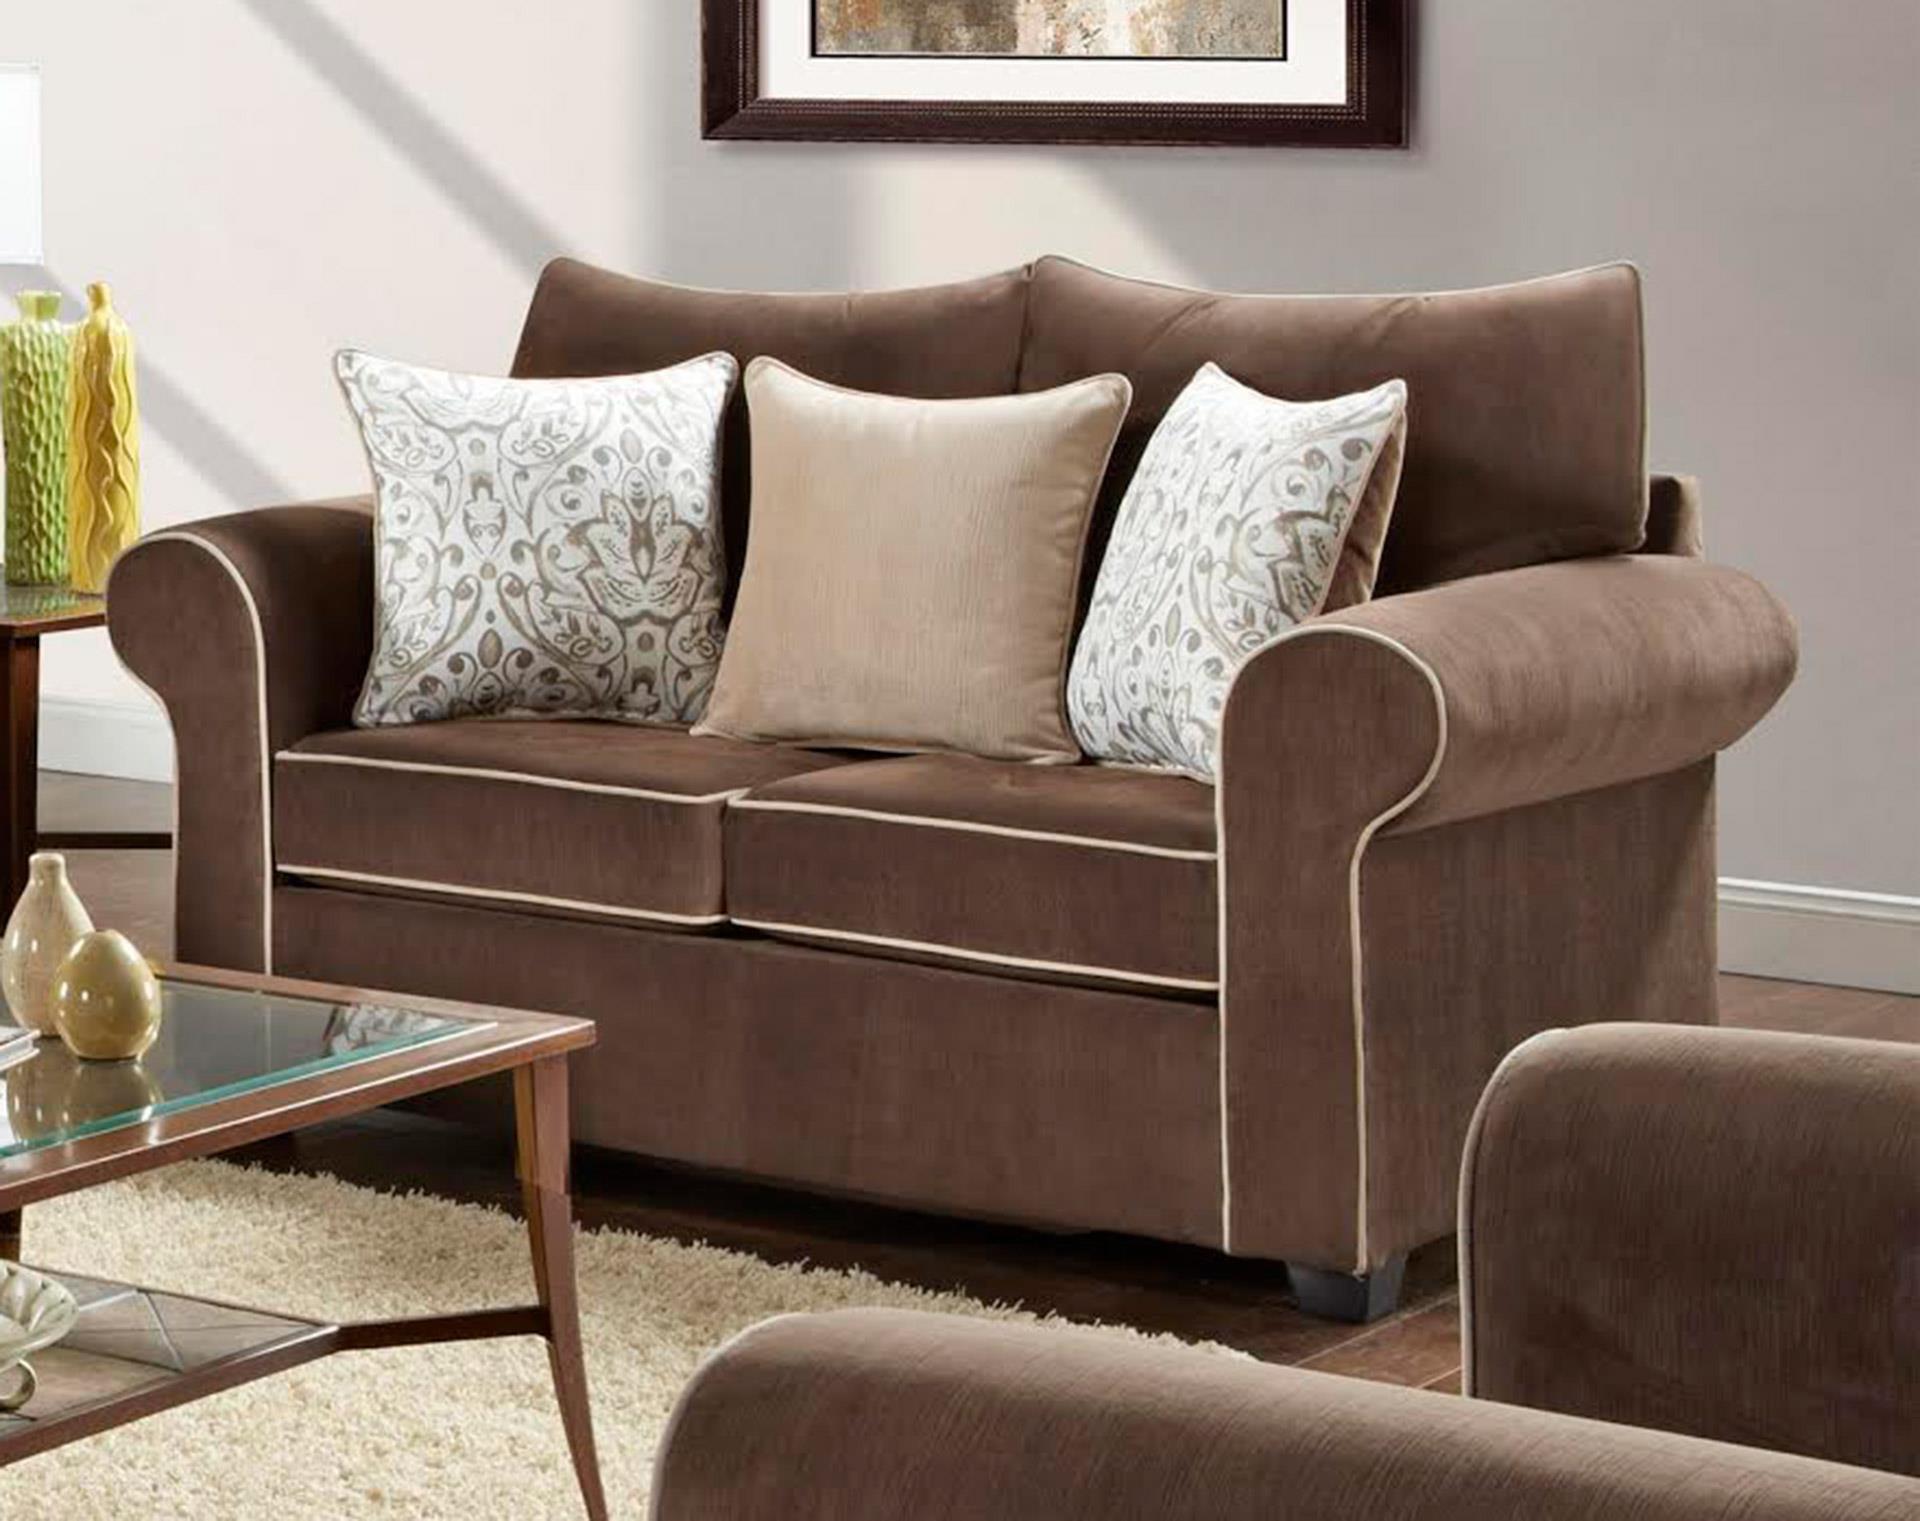 Washington Furniture 5040 Spellbound Fudge Loveseat - Item Number: 5042SPELLBOUND-FUDGE